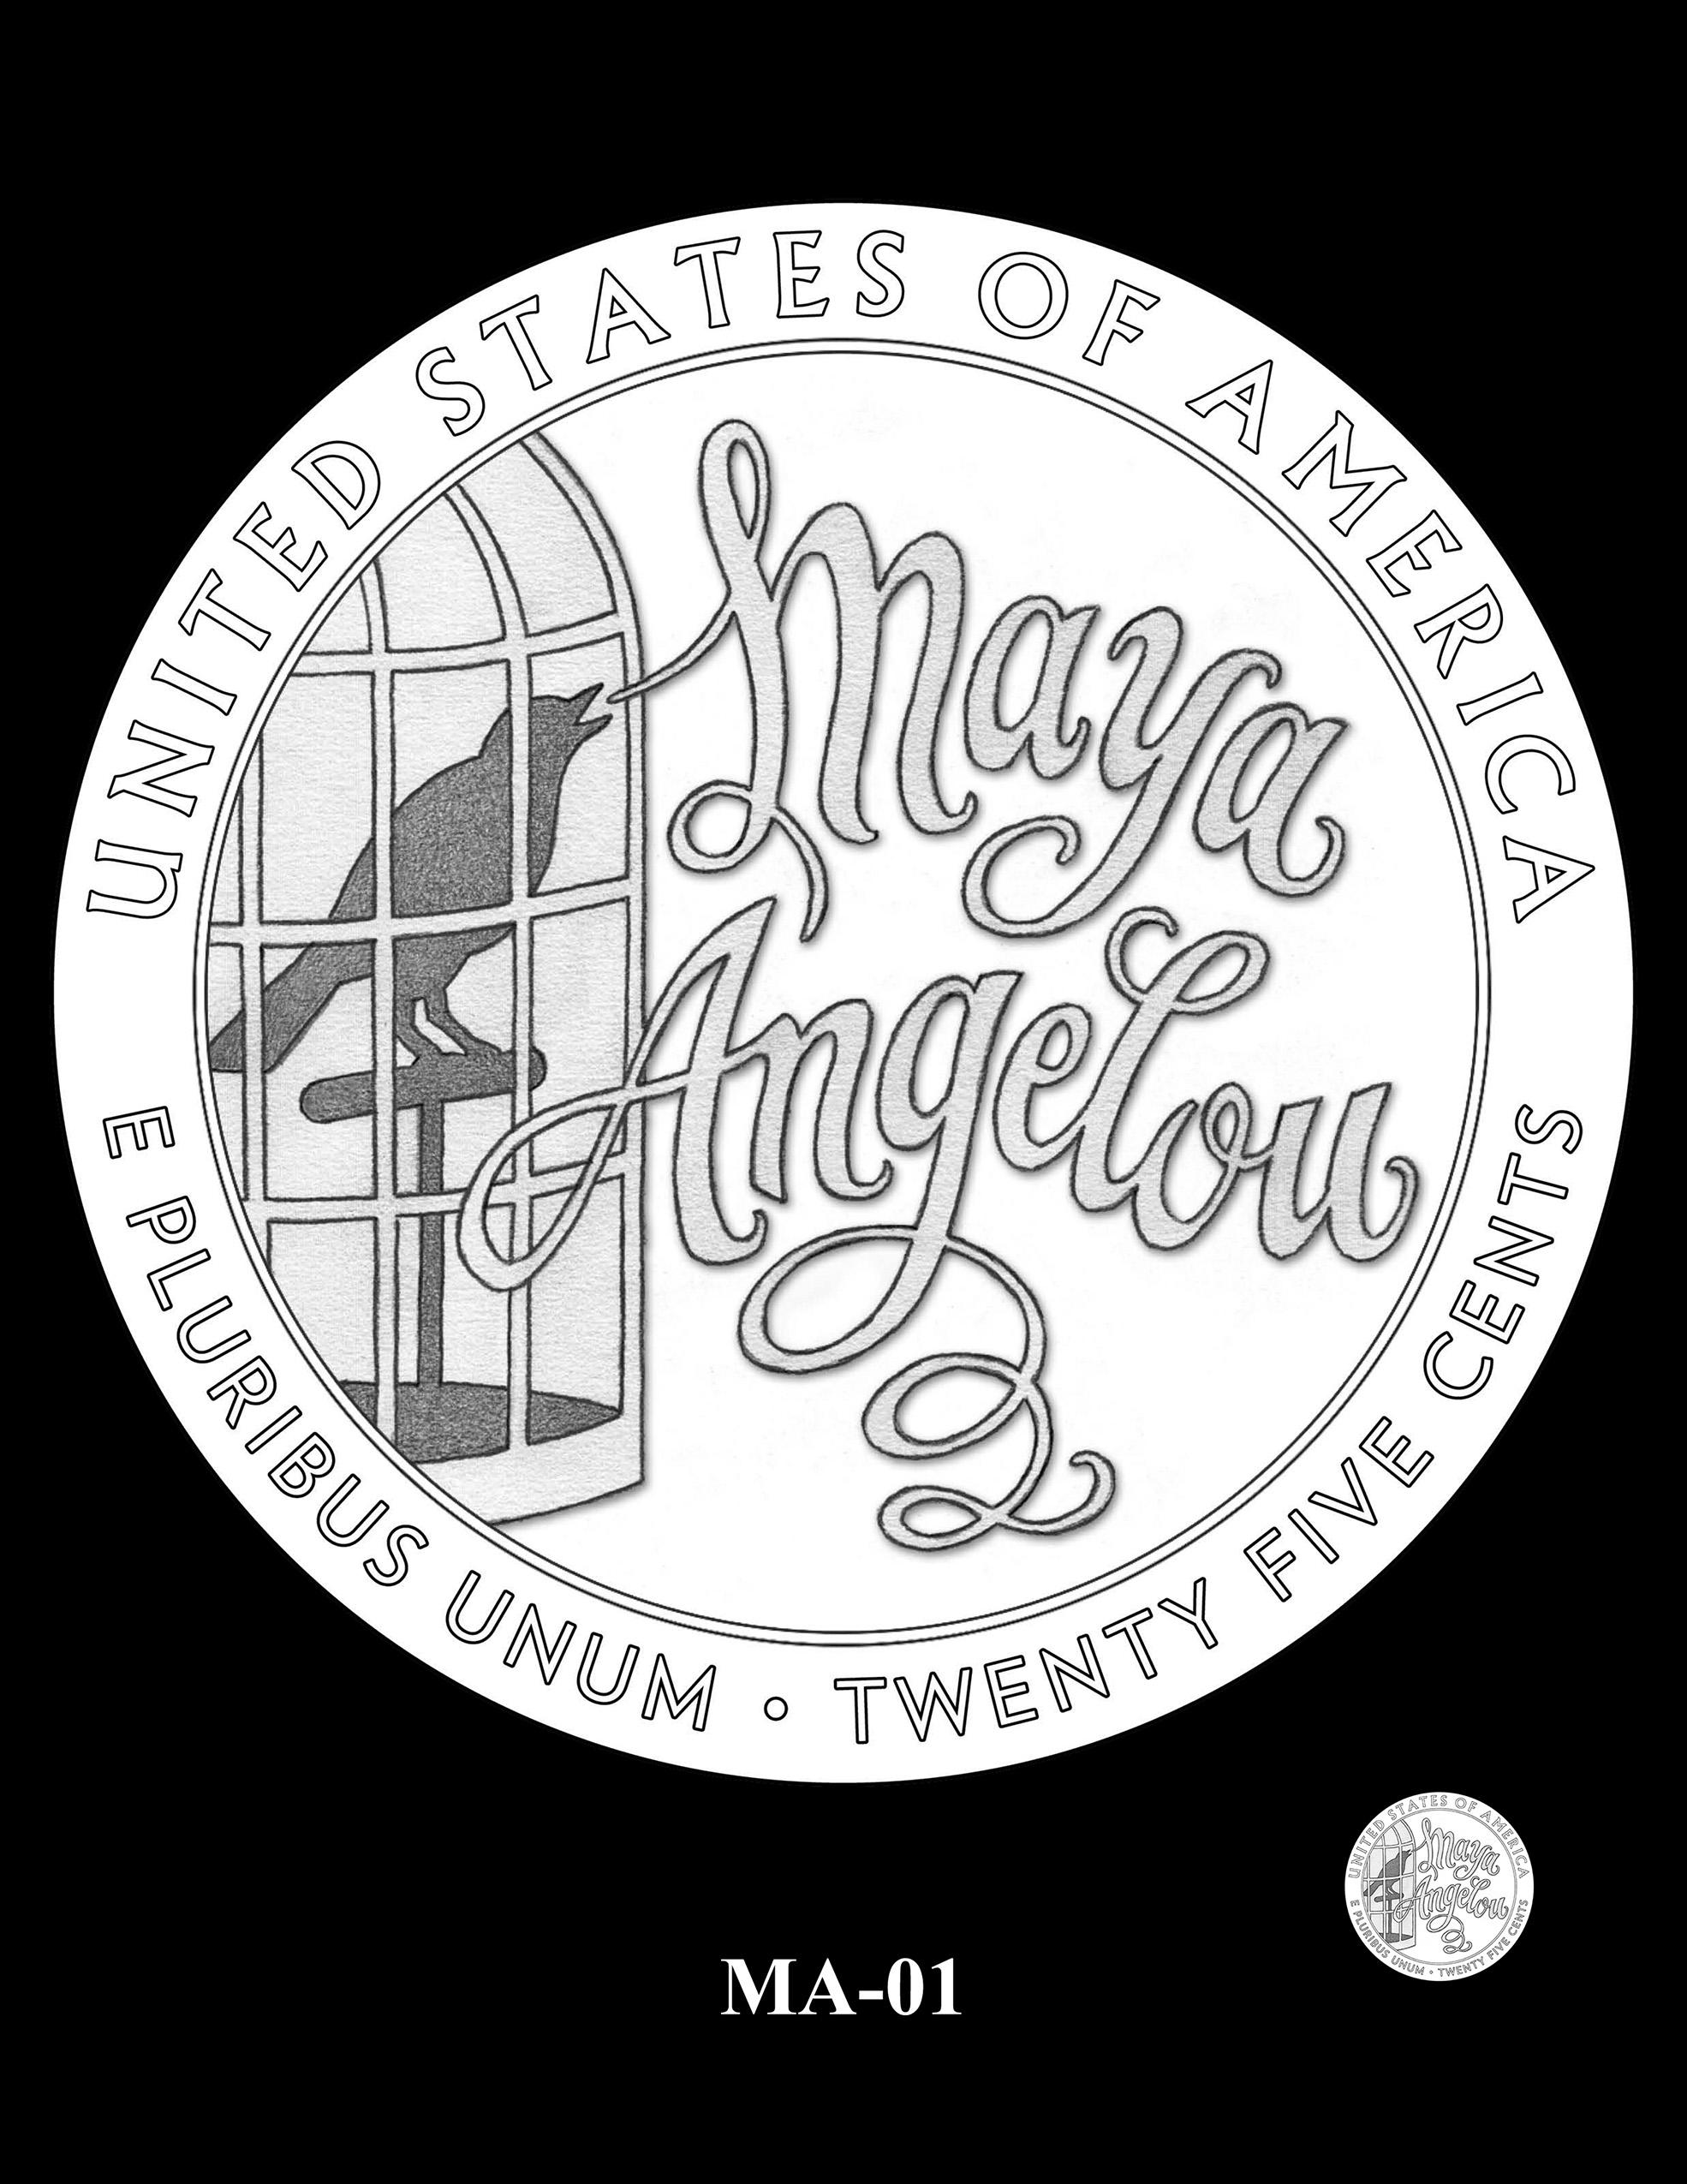 MA-01 -- 2022 American Women Quarters - Maya Angelou Reverse